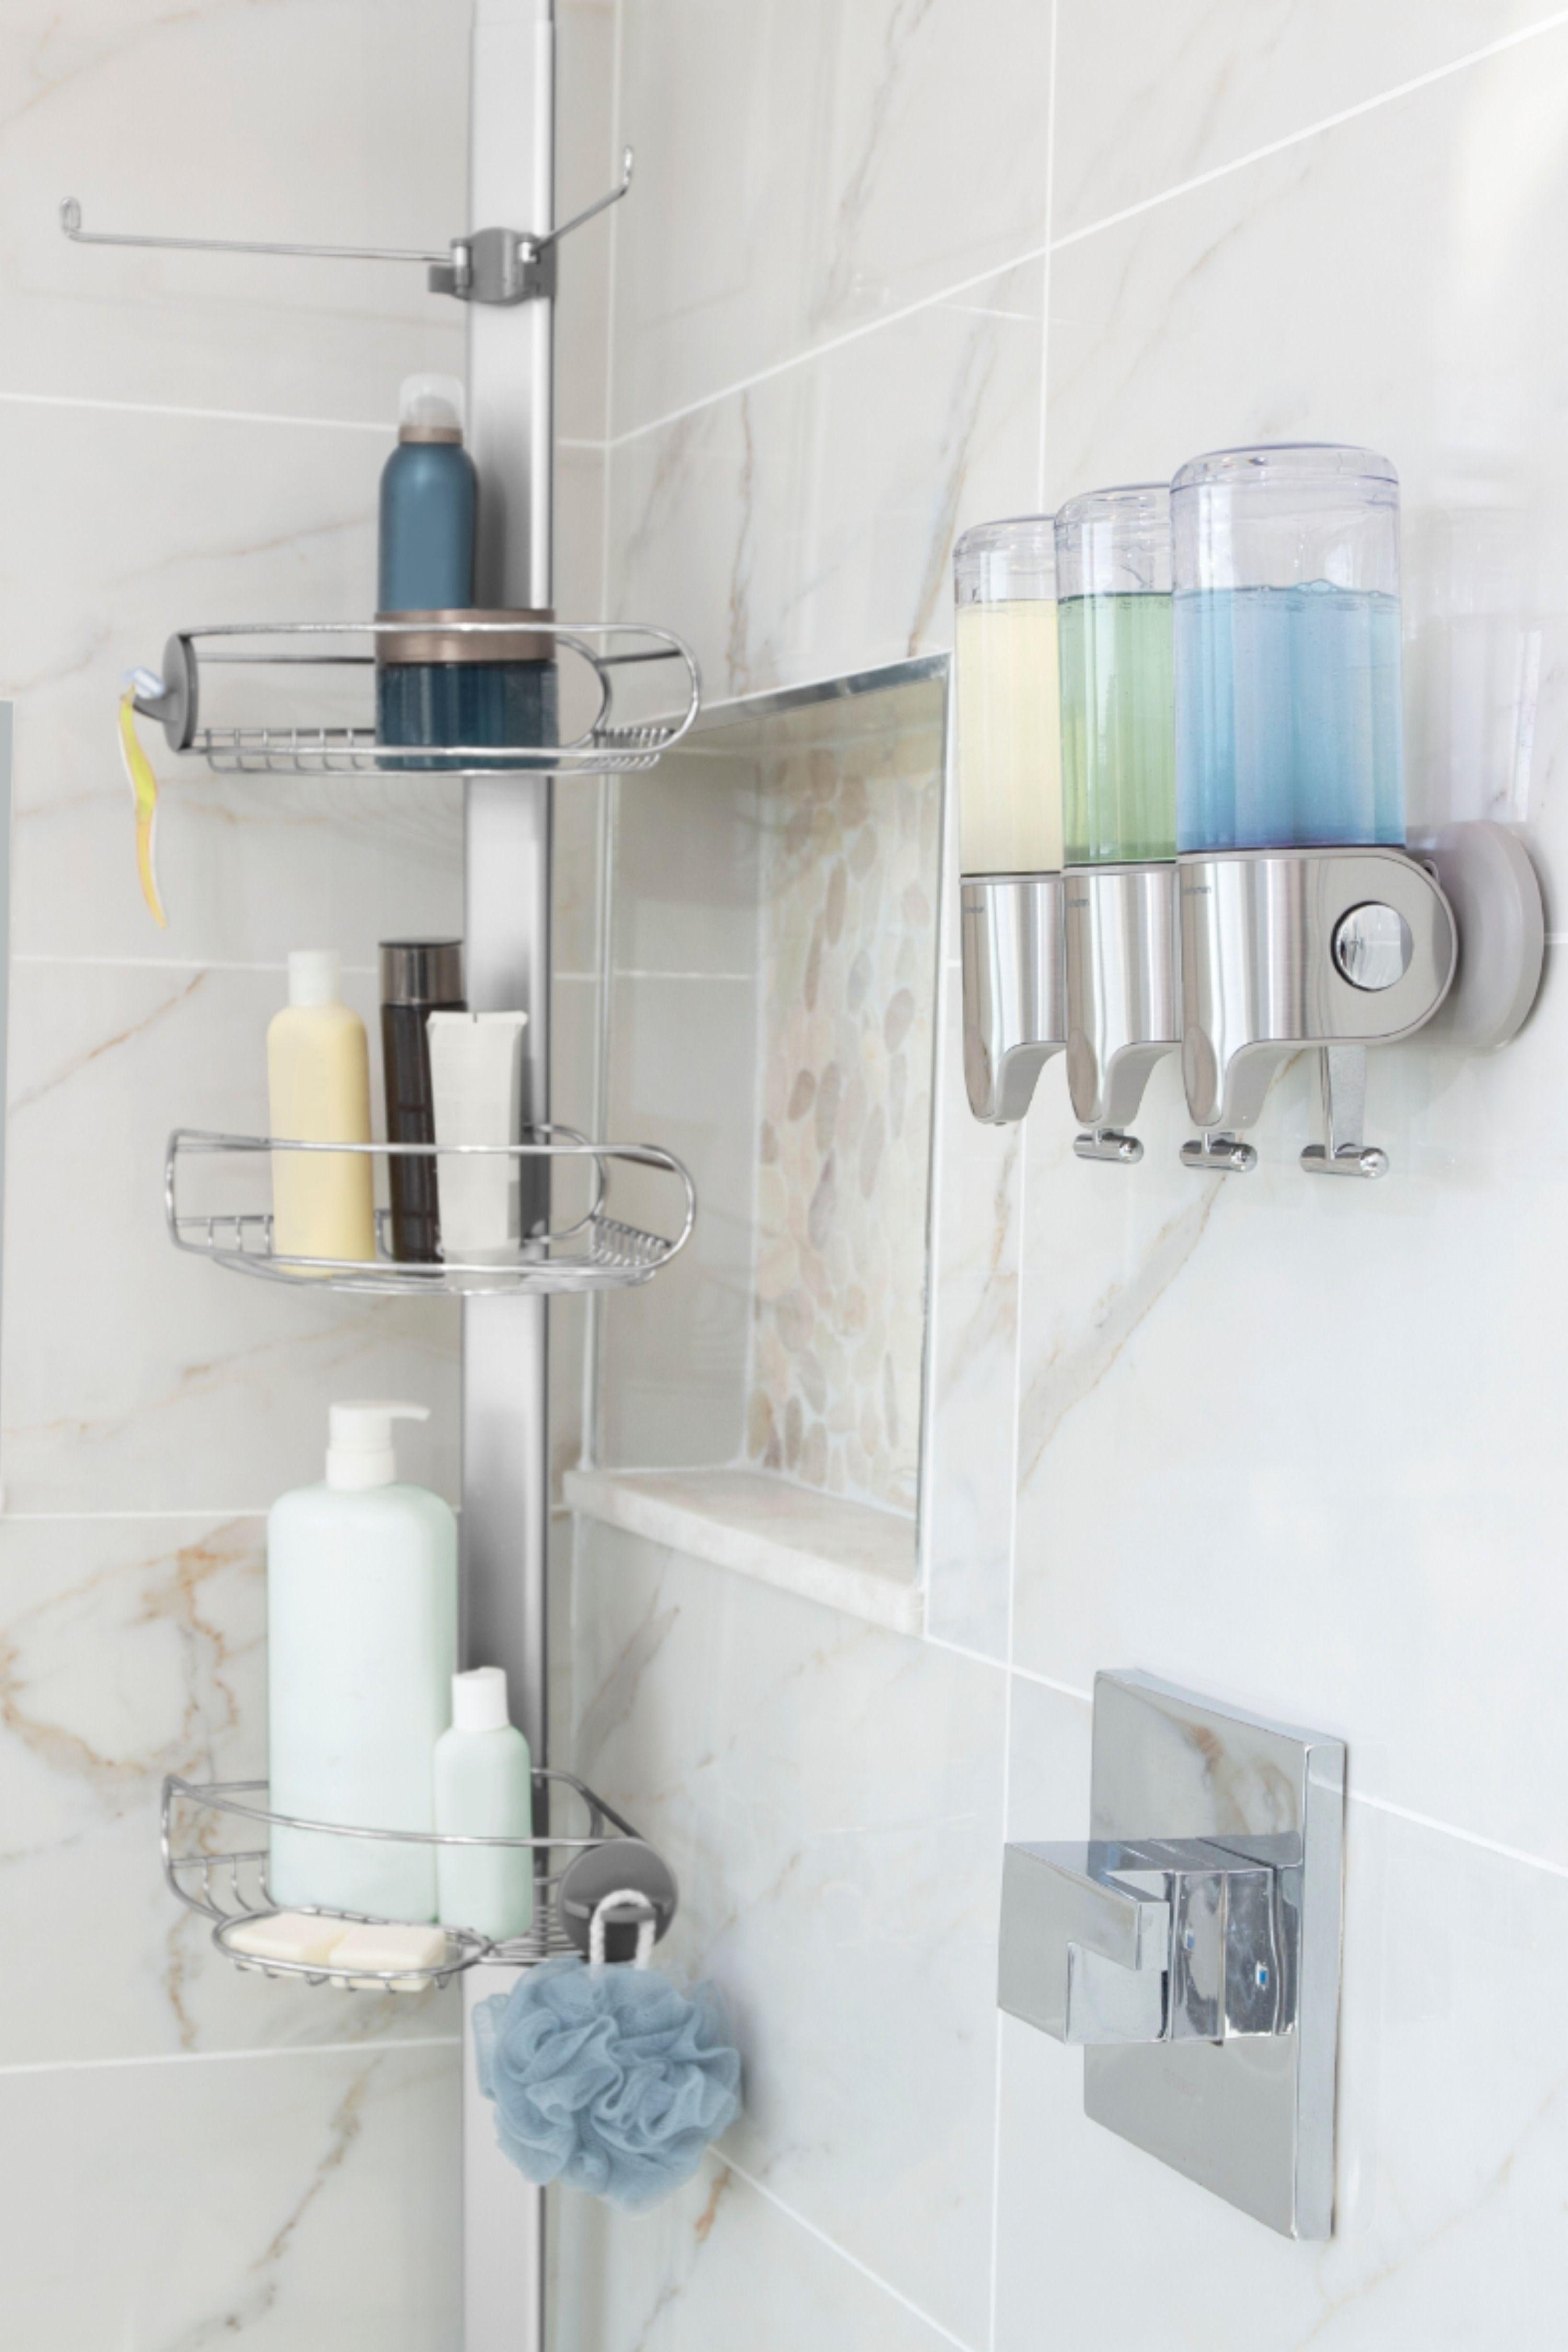 Bath In 2020 Spa Like Bathroom Bathroom Accessories Shower